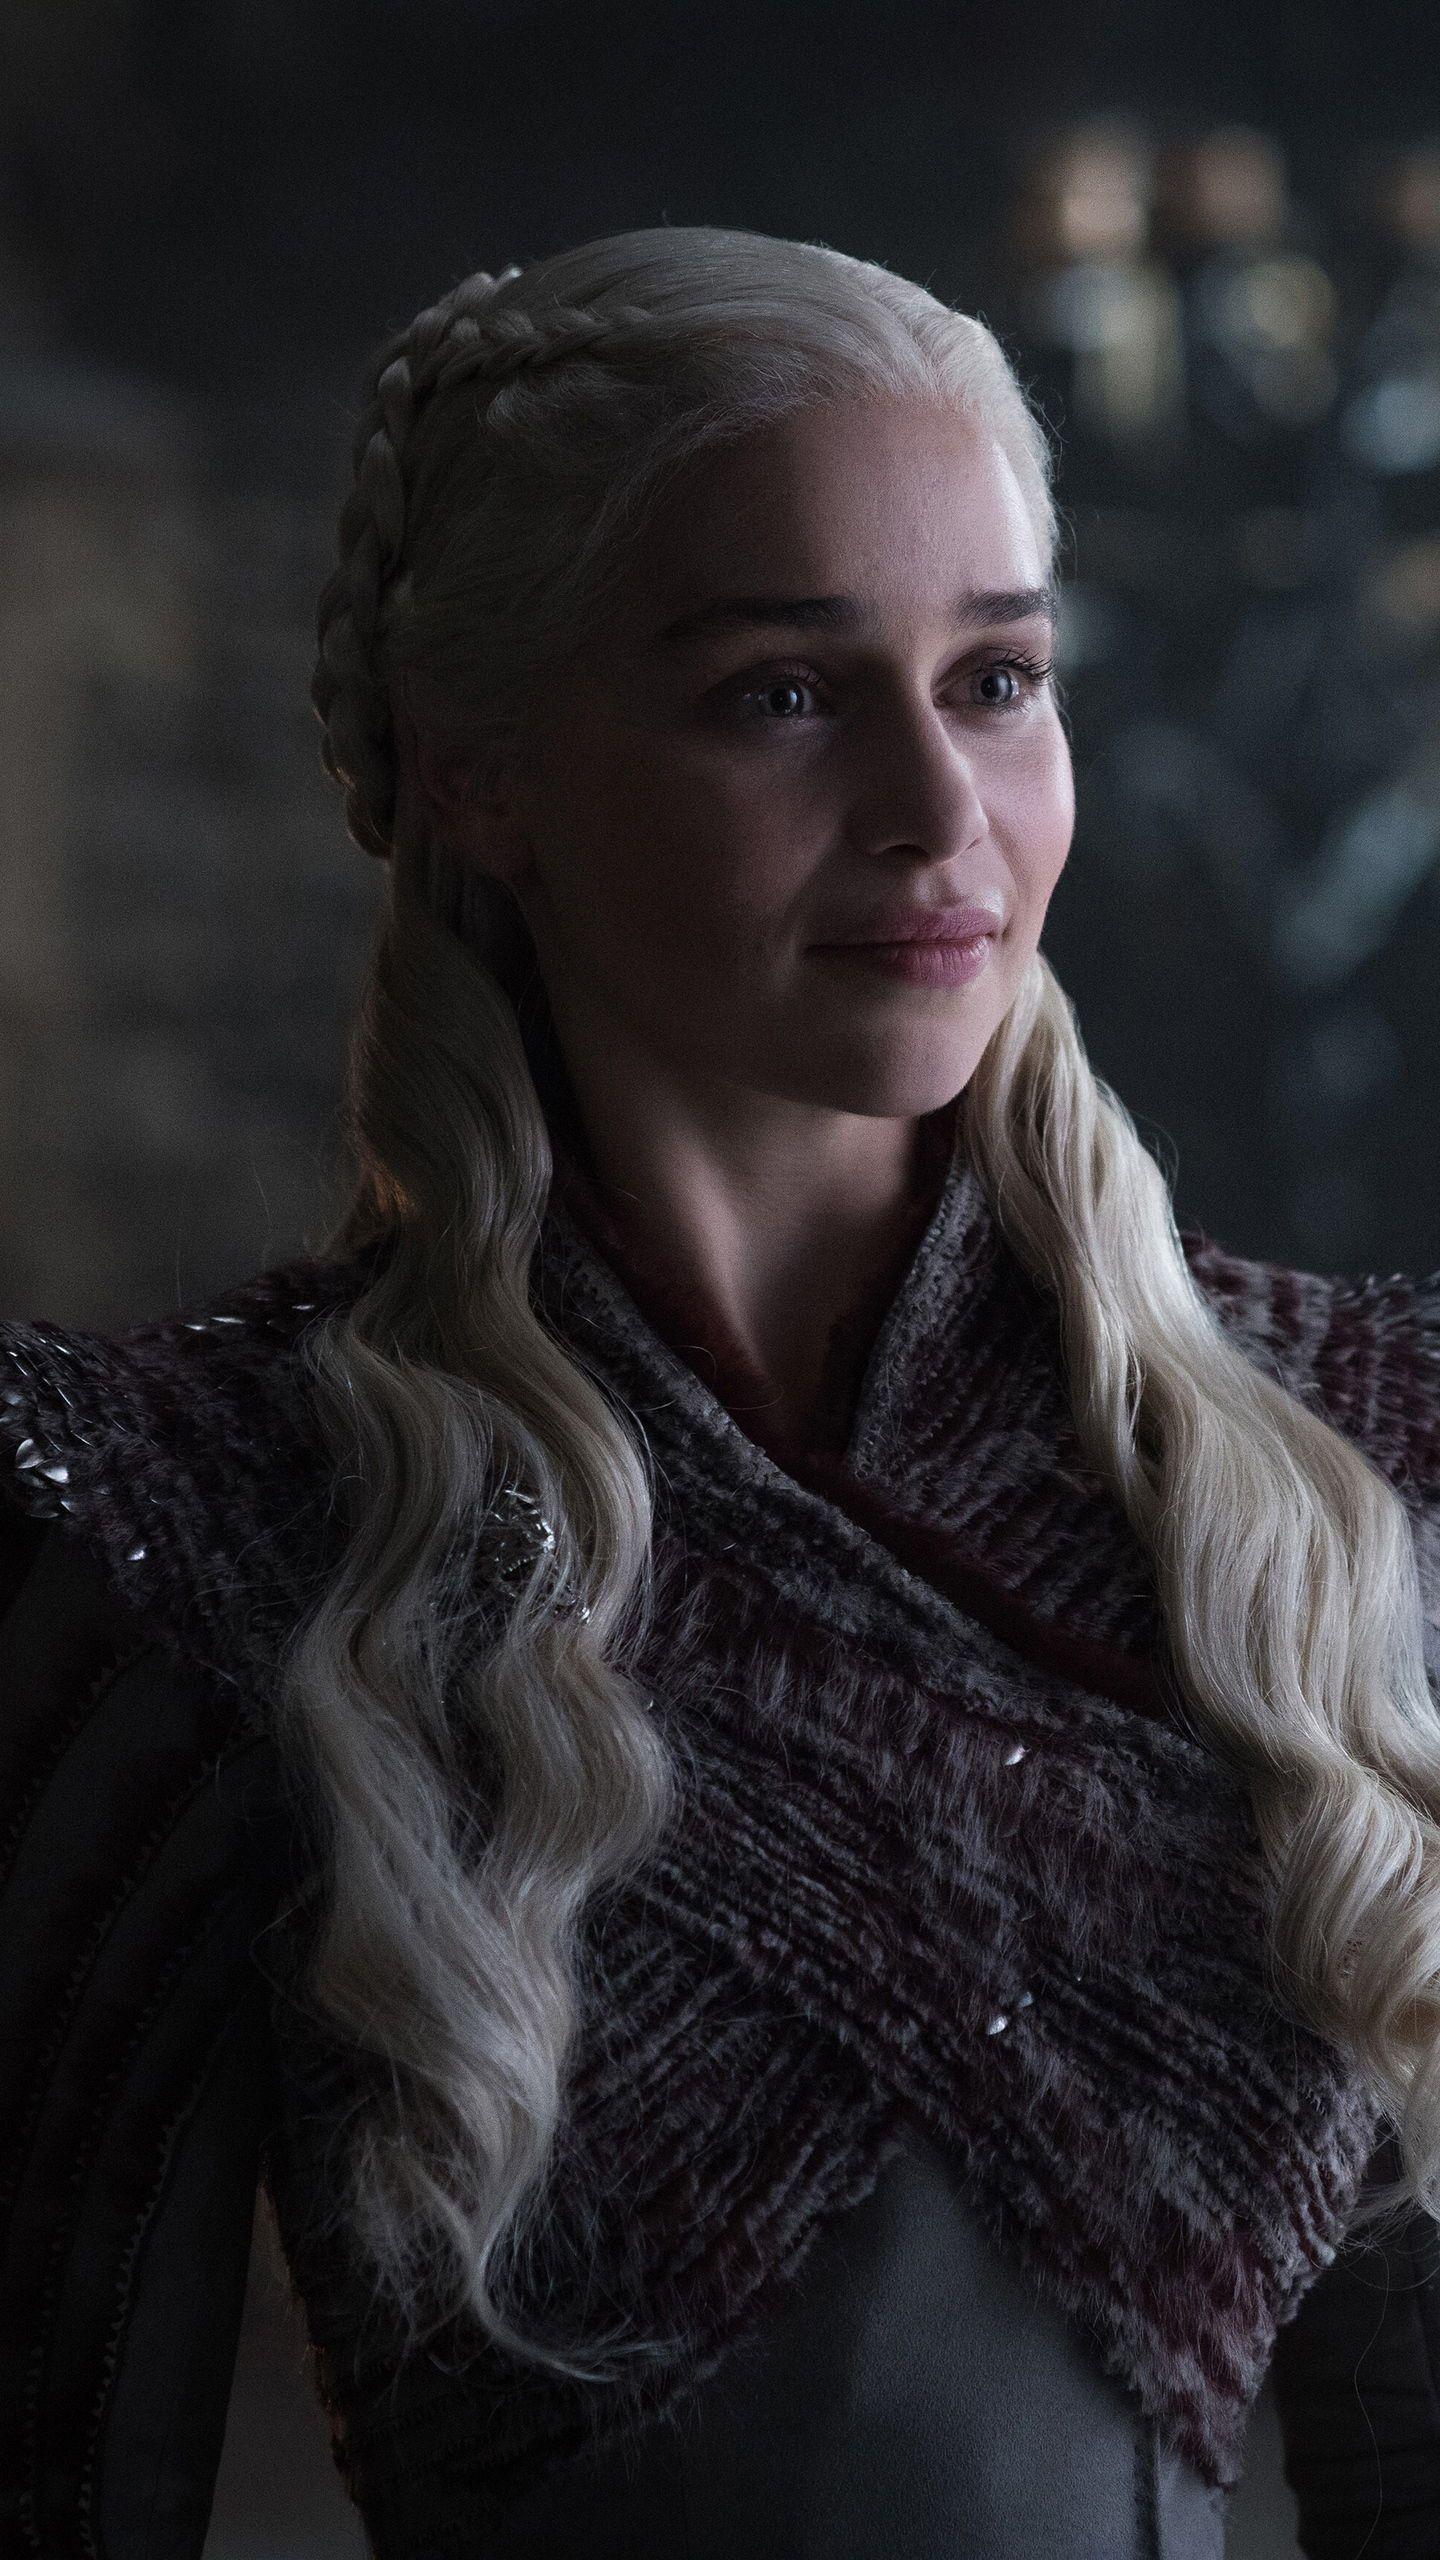 Daenerys Targaryen Wallpaper Game Of Thrones Season 8 First Look Got Game Of Thrones Summary Game Of Throne Daenerys Daenerys And Jon